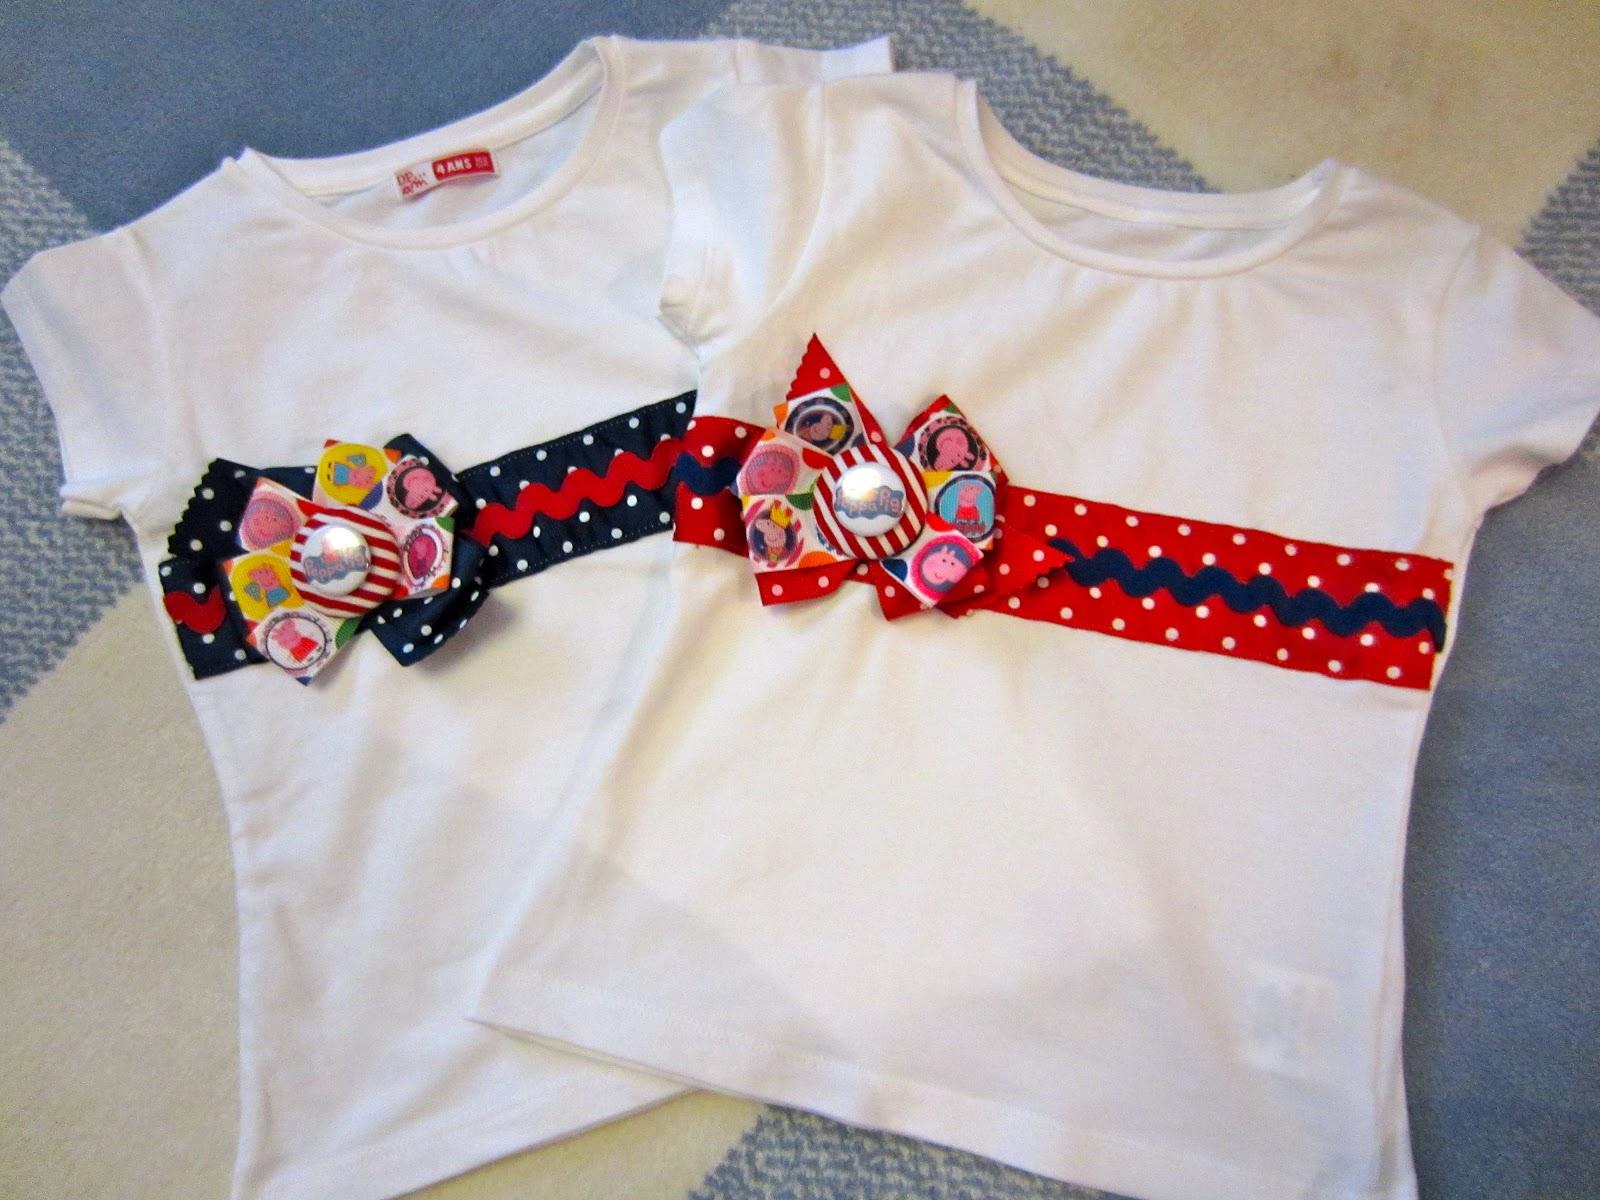 Como Adornar Camisetas Best Detalle Decorar With Como Adornar  ~ Ideas Para Decorar Camisetas Infantiles